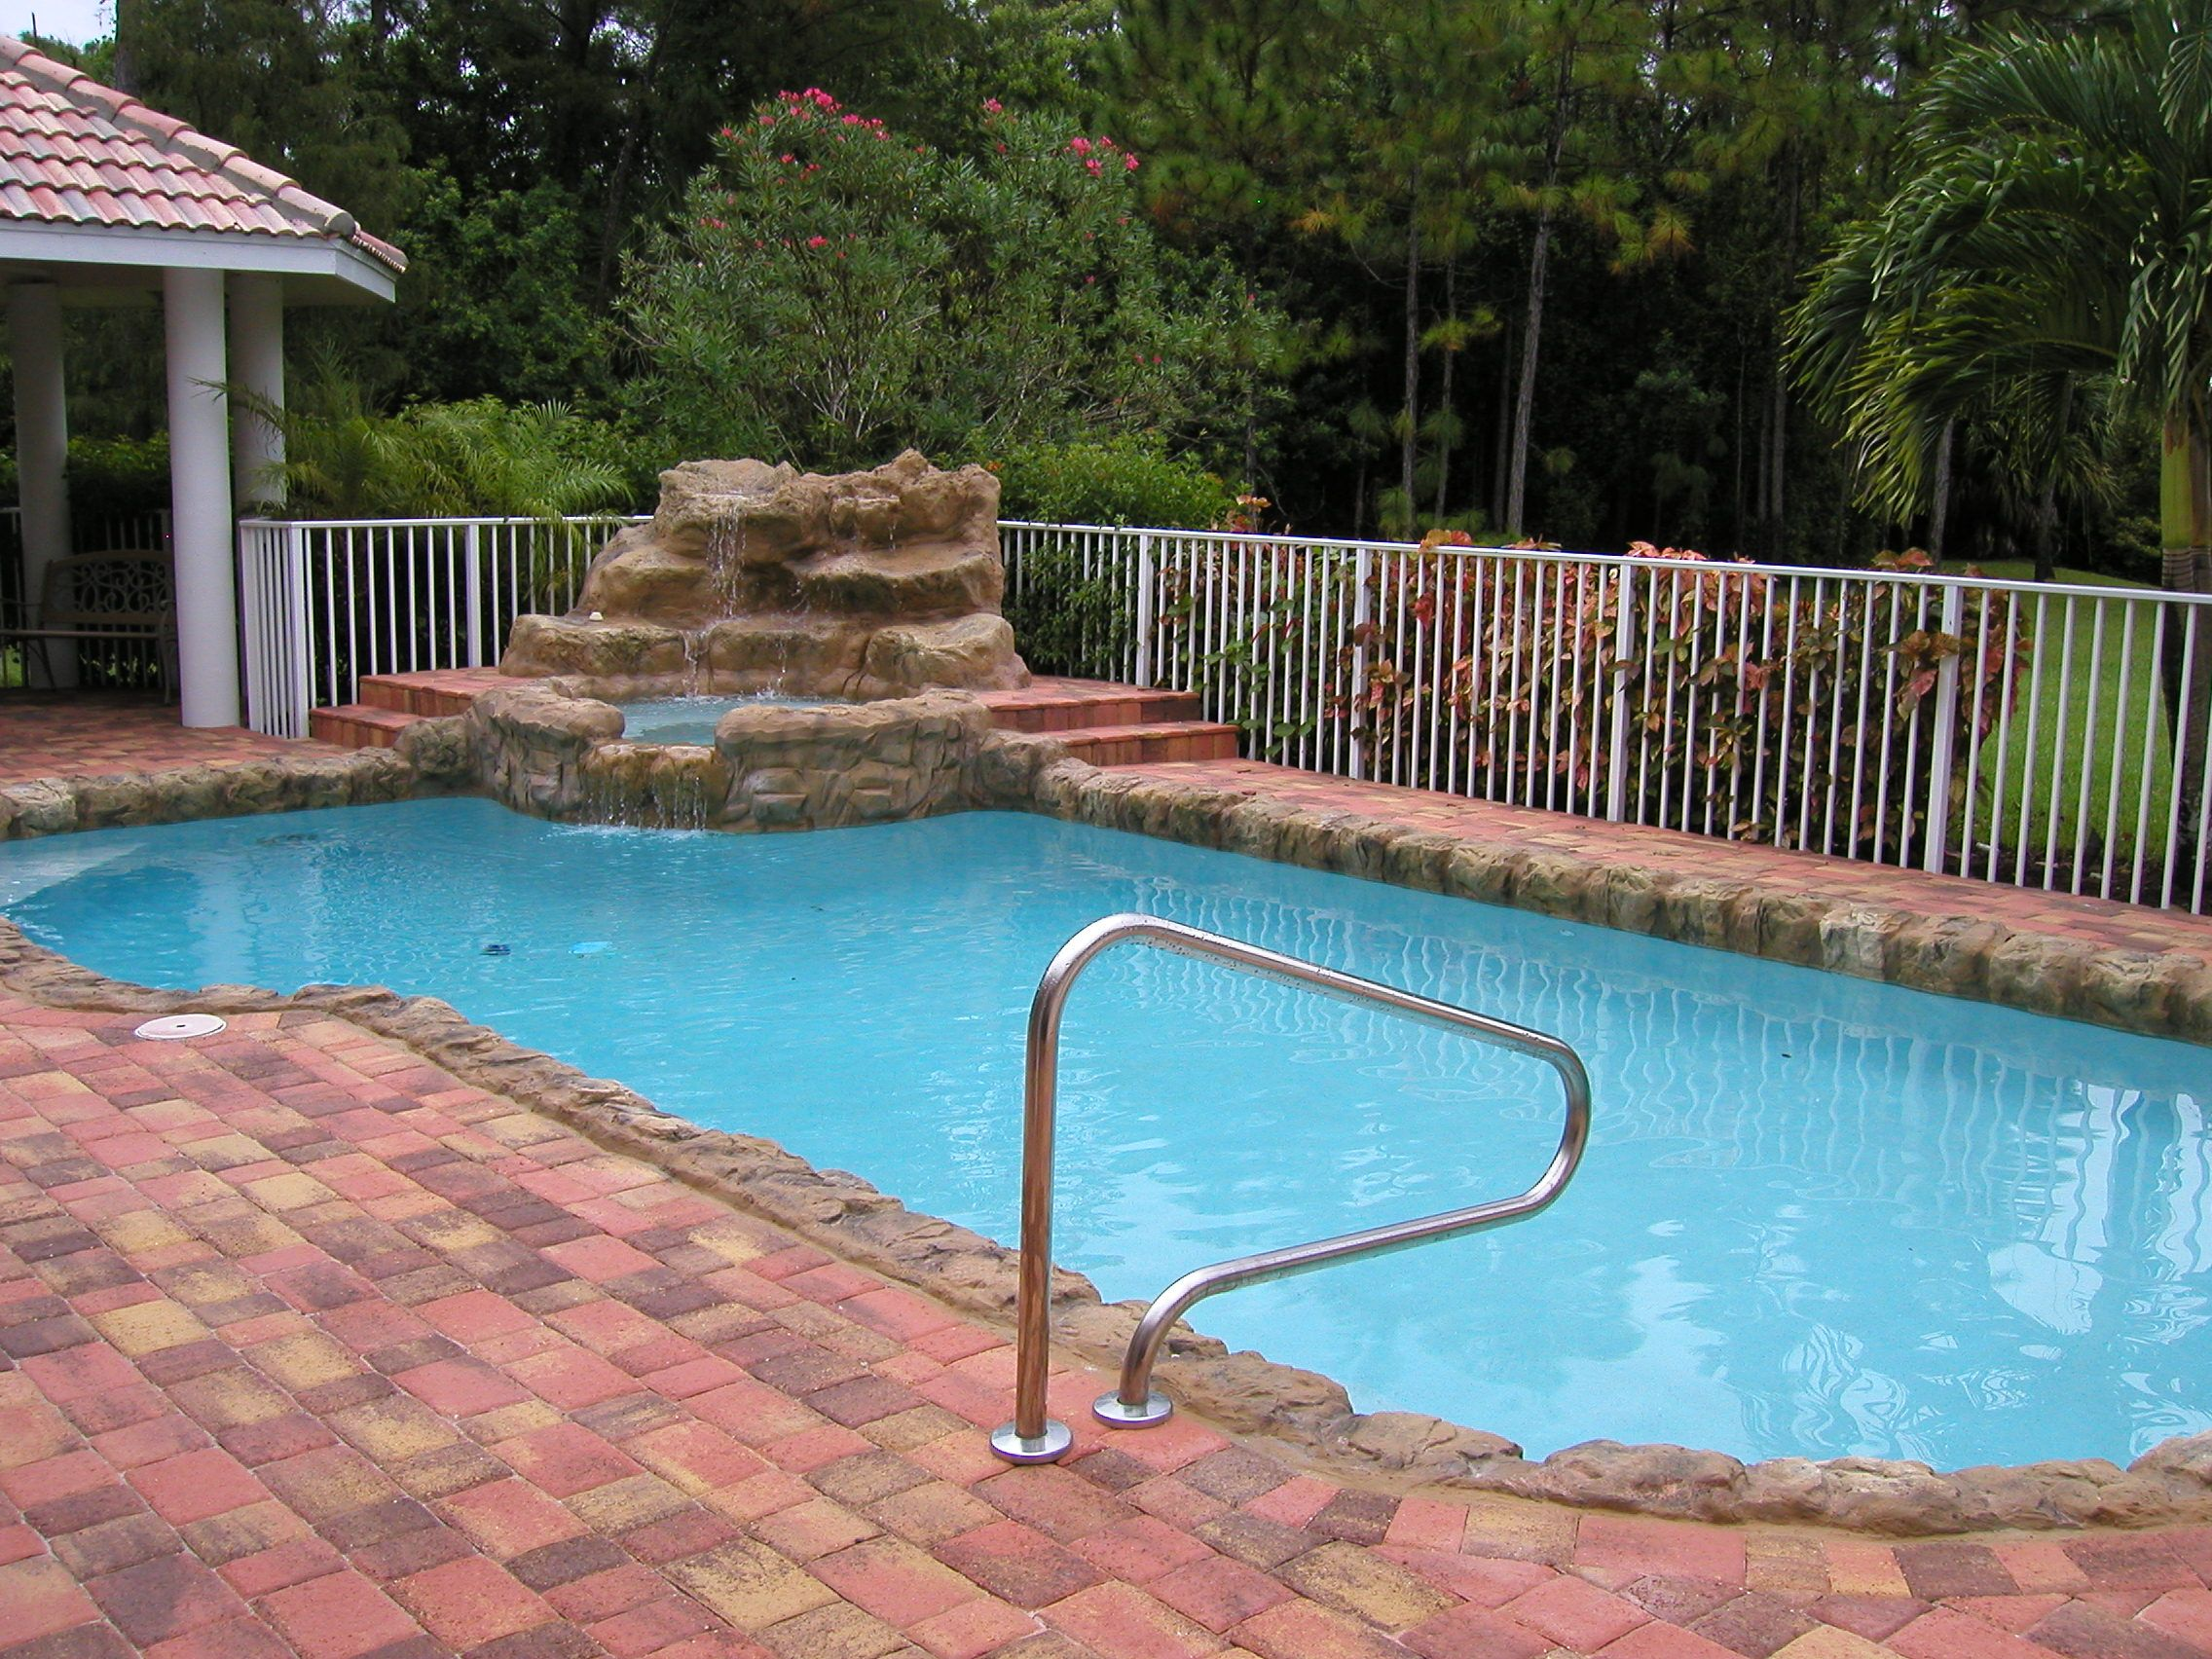 Custom Free Form Pool Rock Waterfall White Aluminum Rail Fence Brick Paver Deck And Handrail Pool Builders Custom Pools Swimming Pool Construction